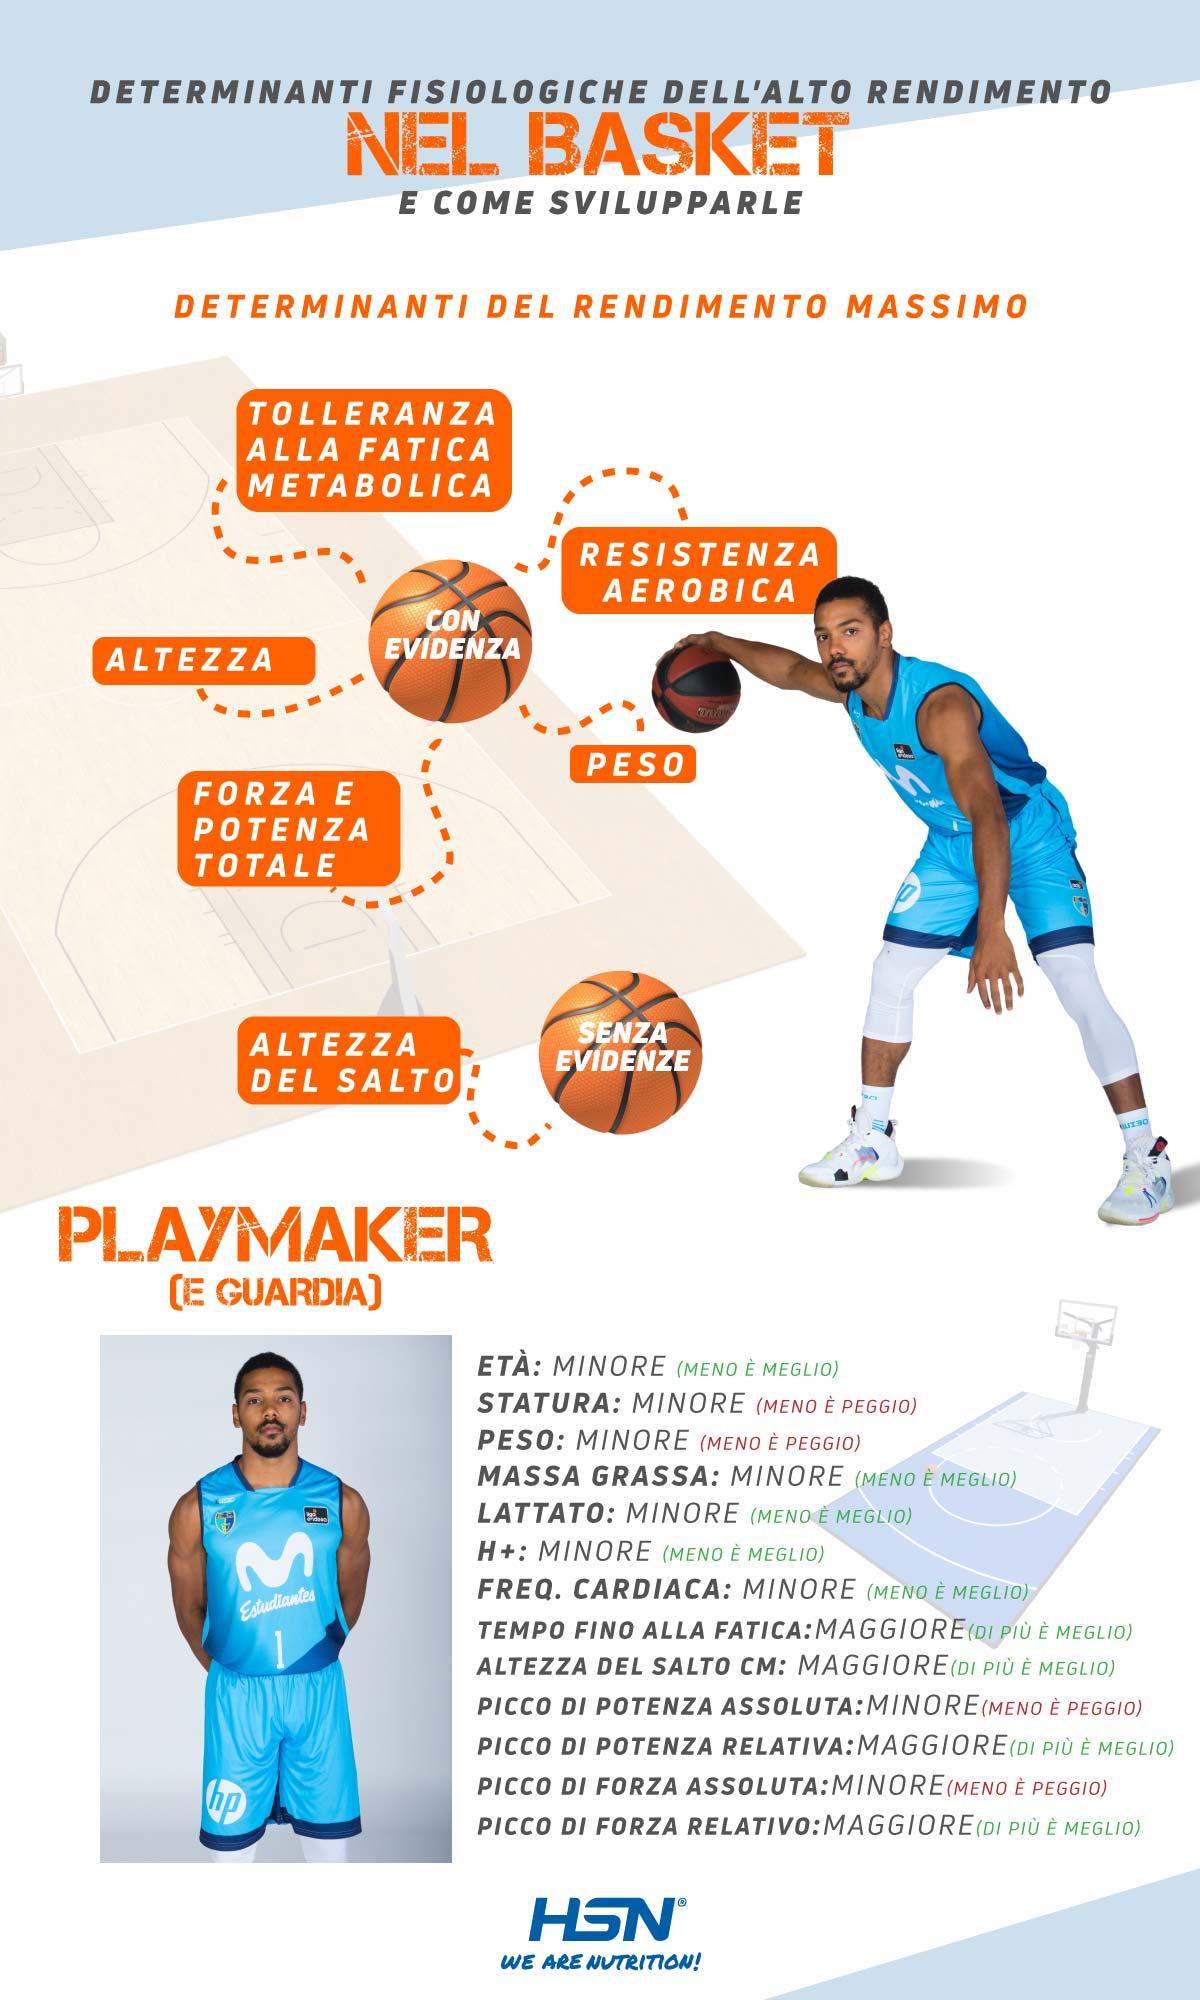 Infografia Determinanti Fisiologici nel Basket